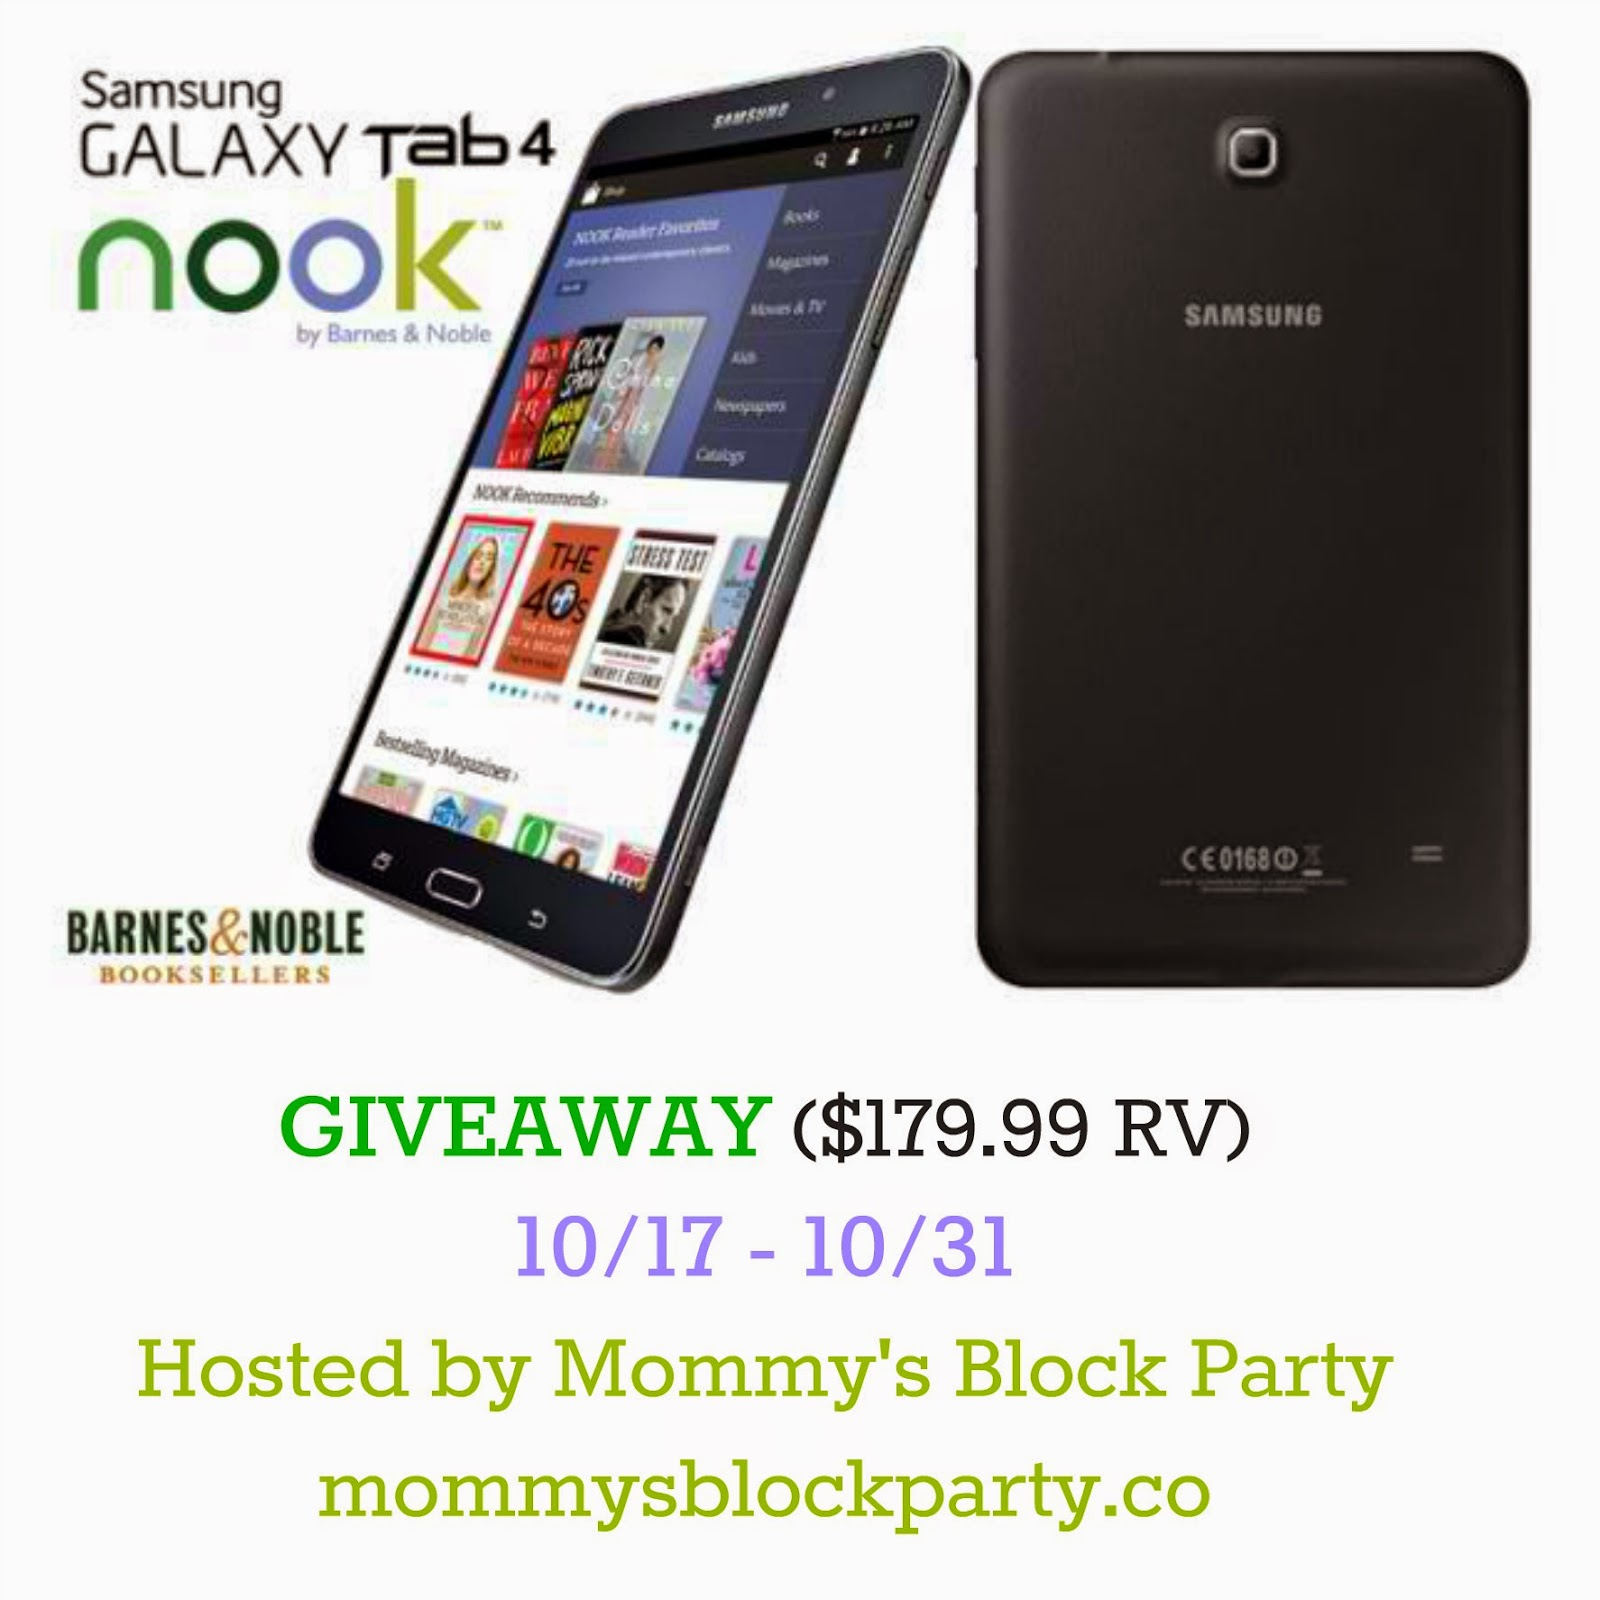 Giveaway: Samsung Galaxy Tab 4 NOOK ends 10/31